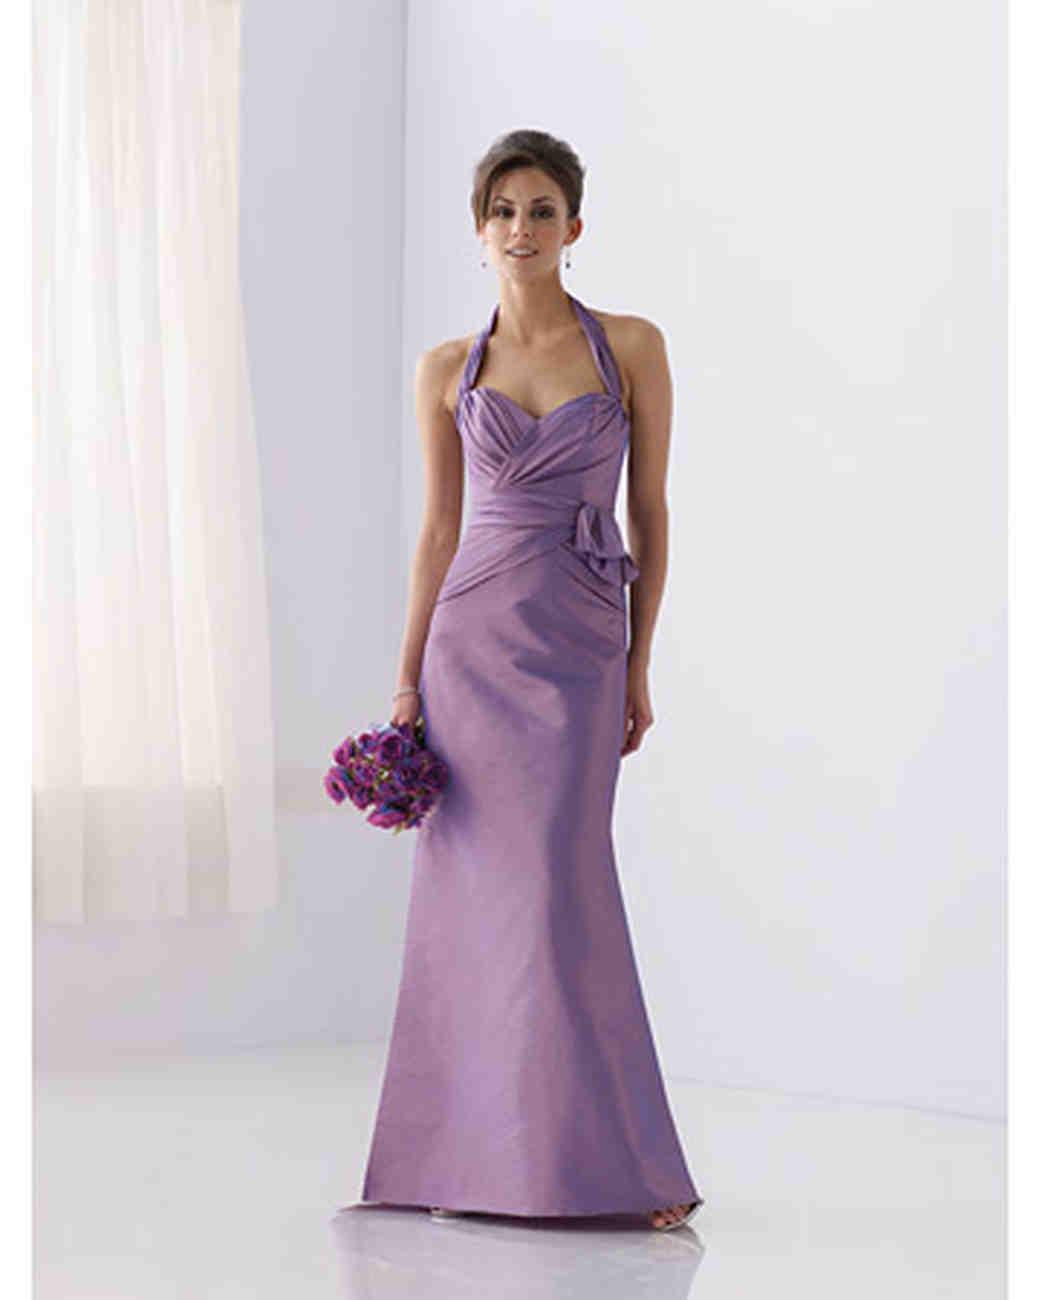 wd105835_spring11_sopiam_by21040_purple_009.jpg